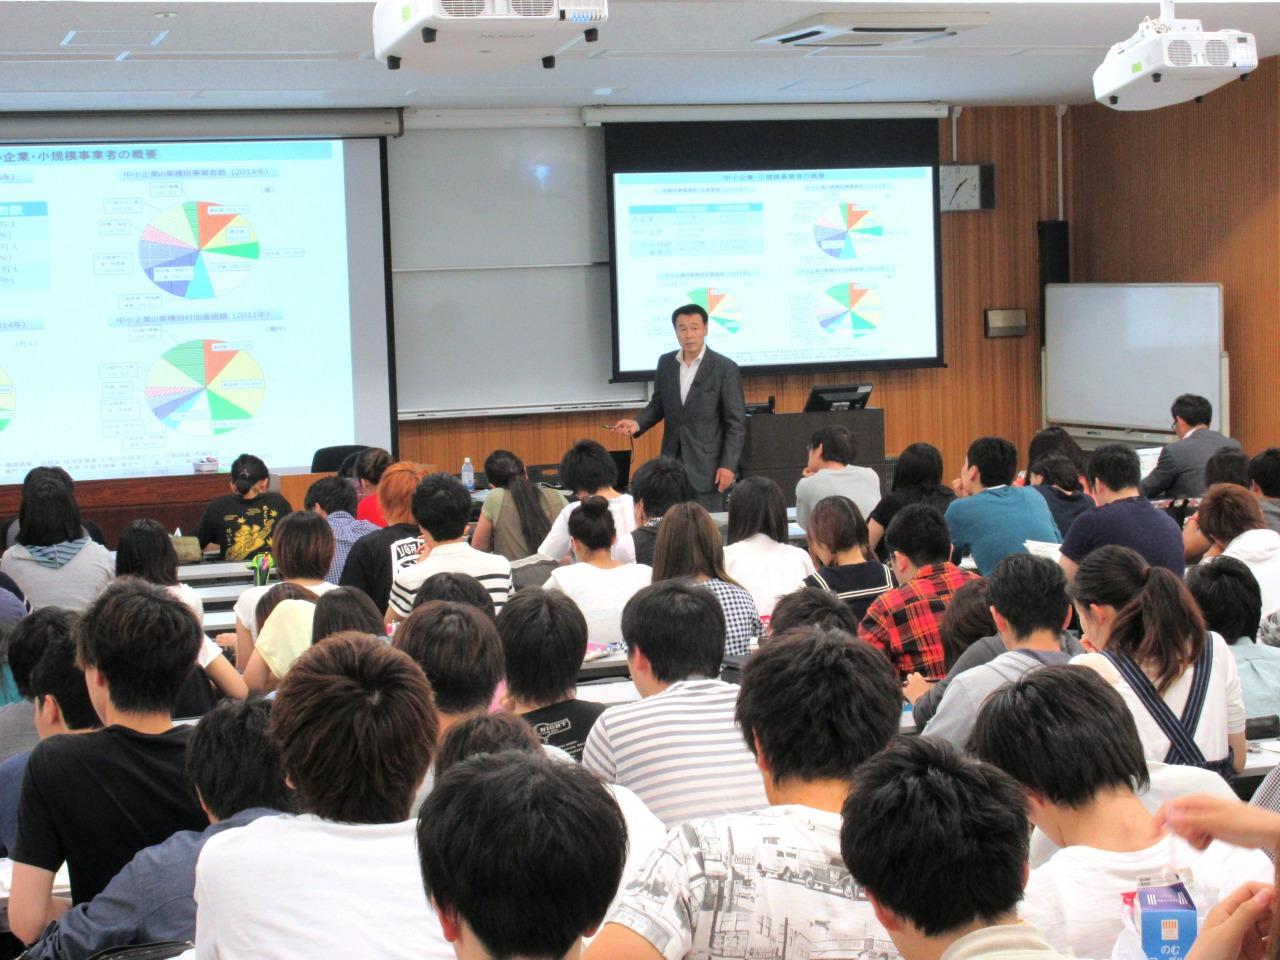 http://www.shinshu-u.ac.jp/faculty/econlaw/topics/images/s-IMG_0817.jpg